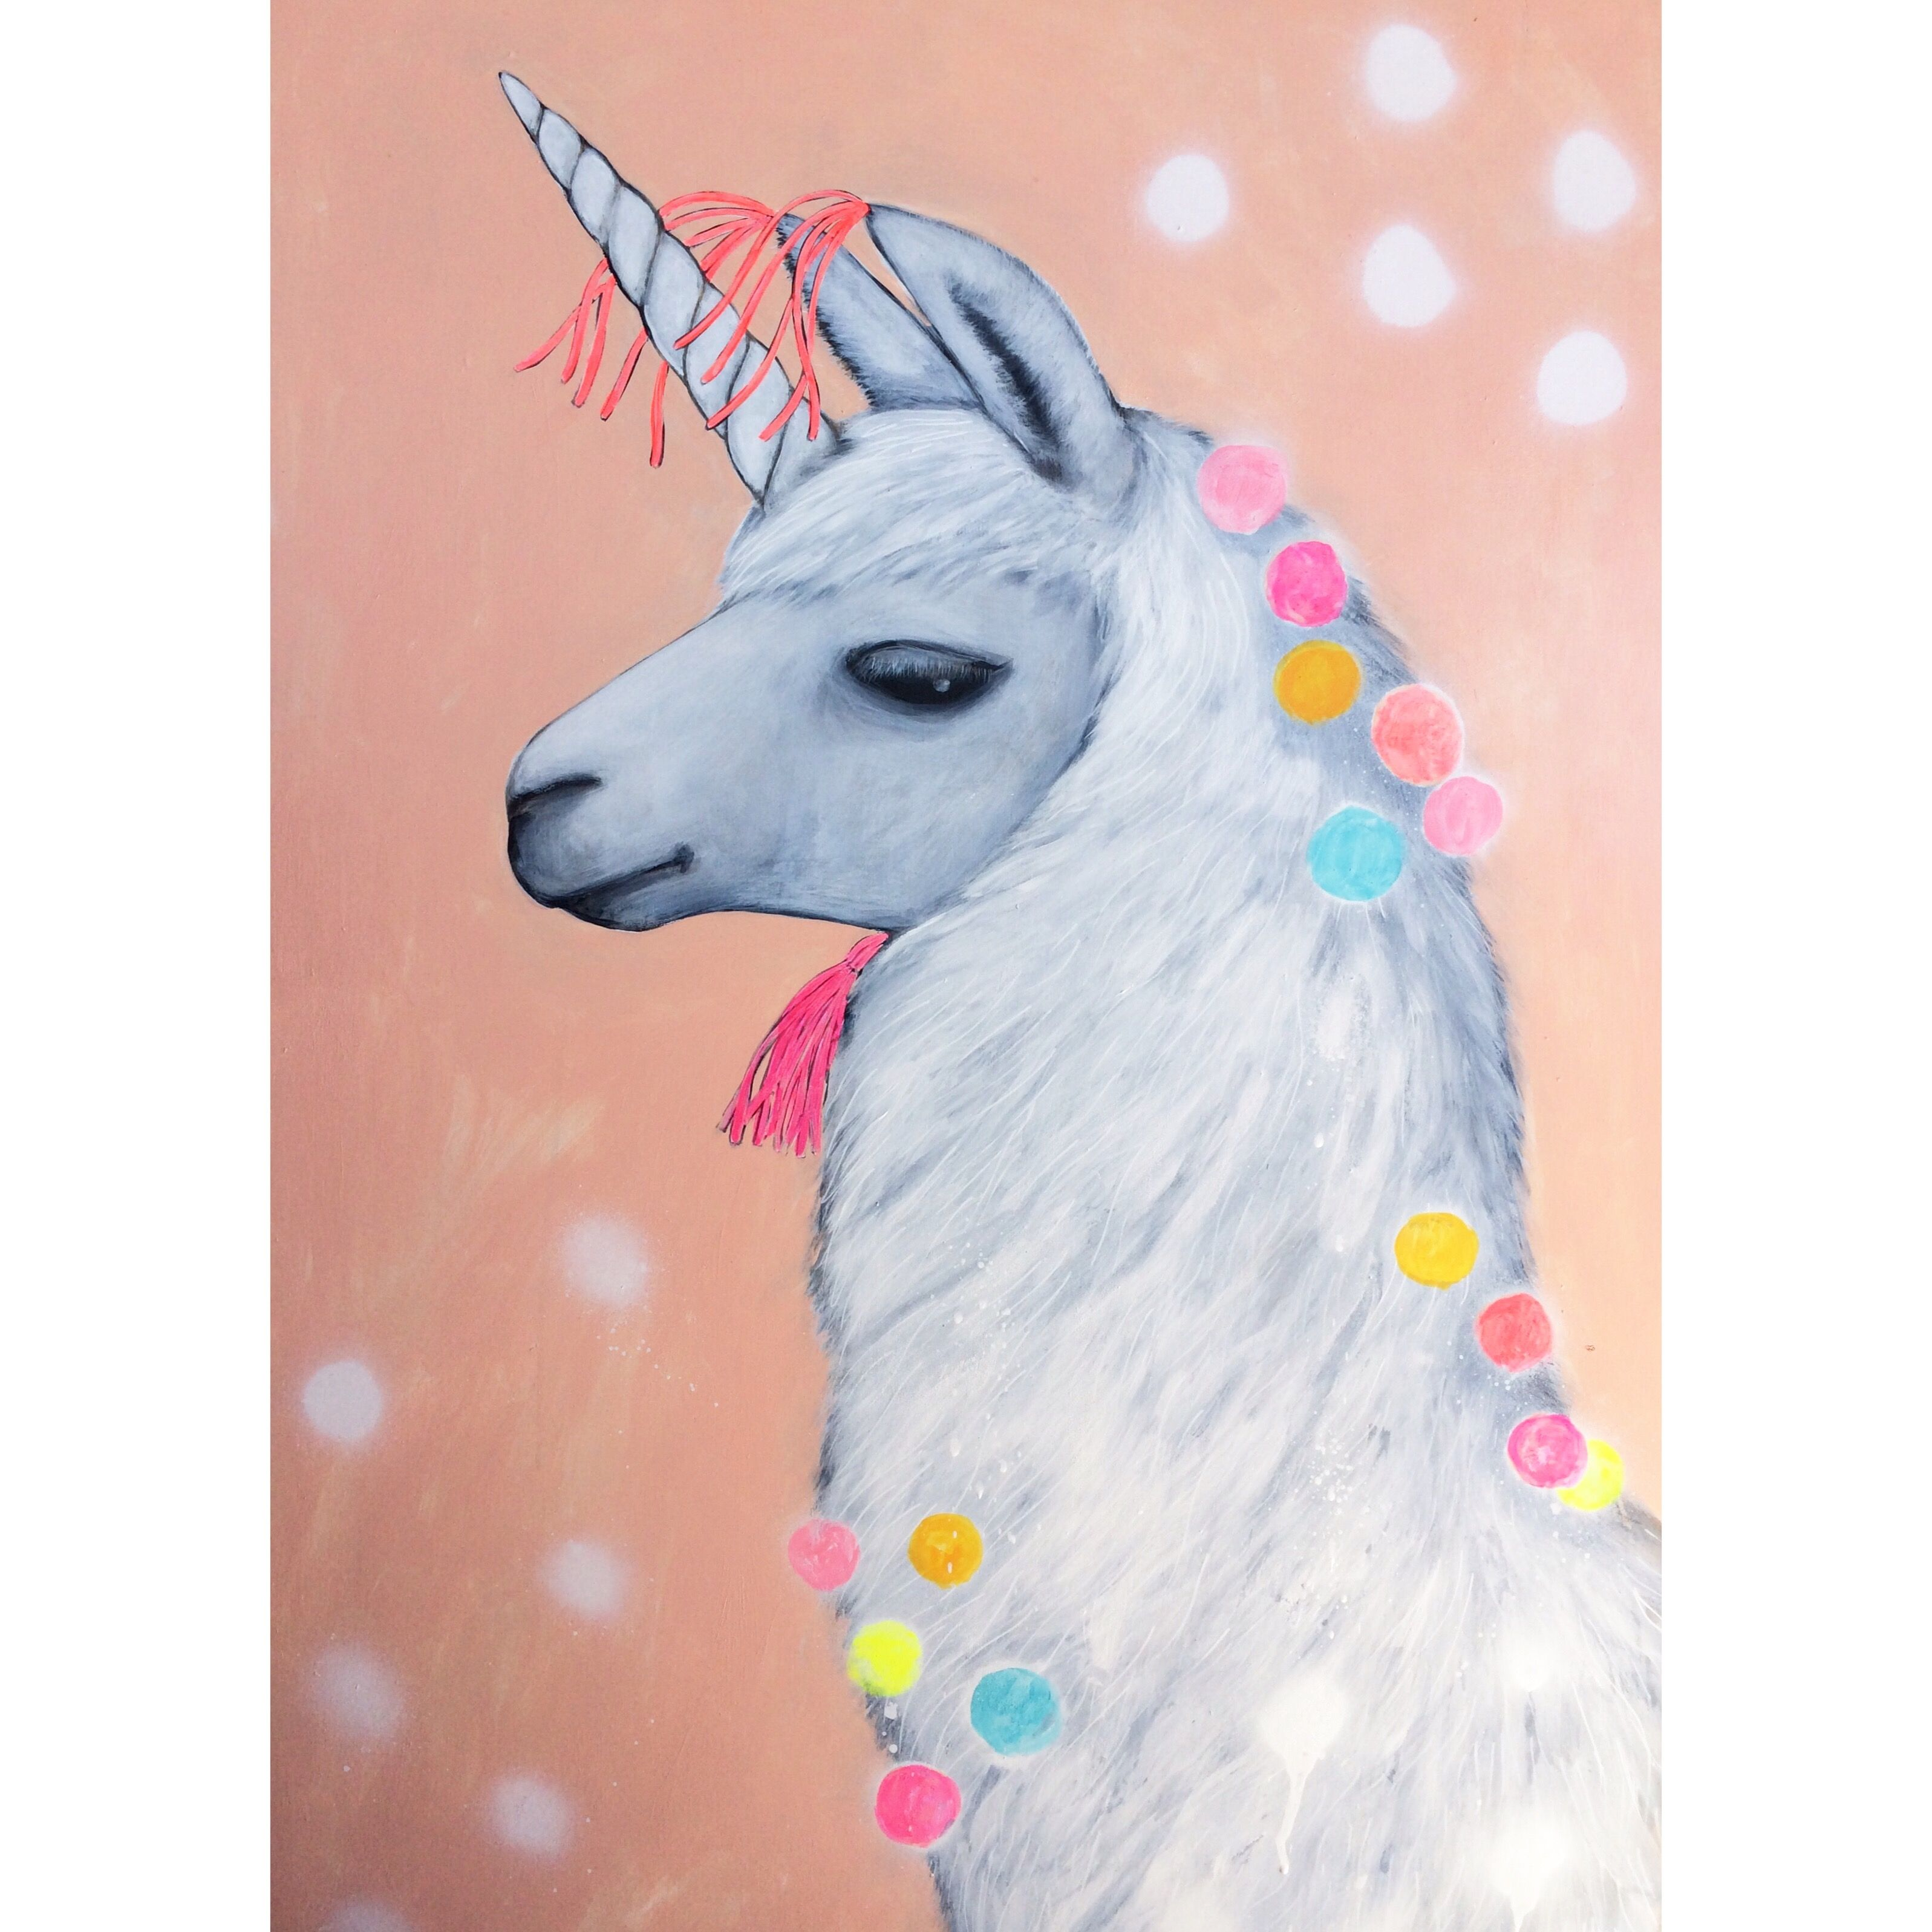 Unicorn Llama aka Llamacorn; 'Come Away With me ...